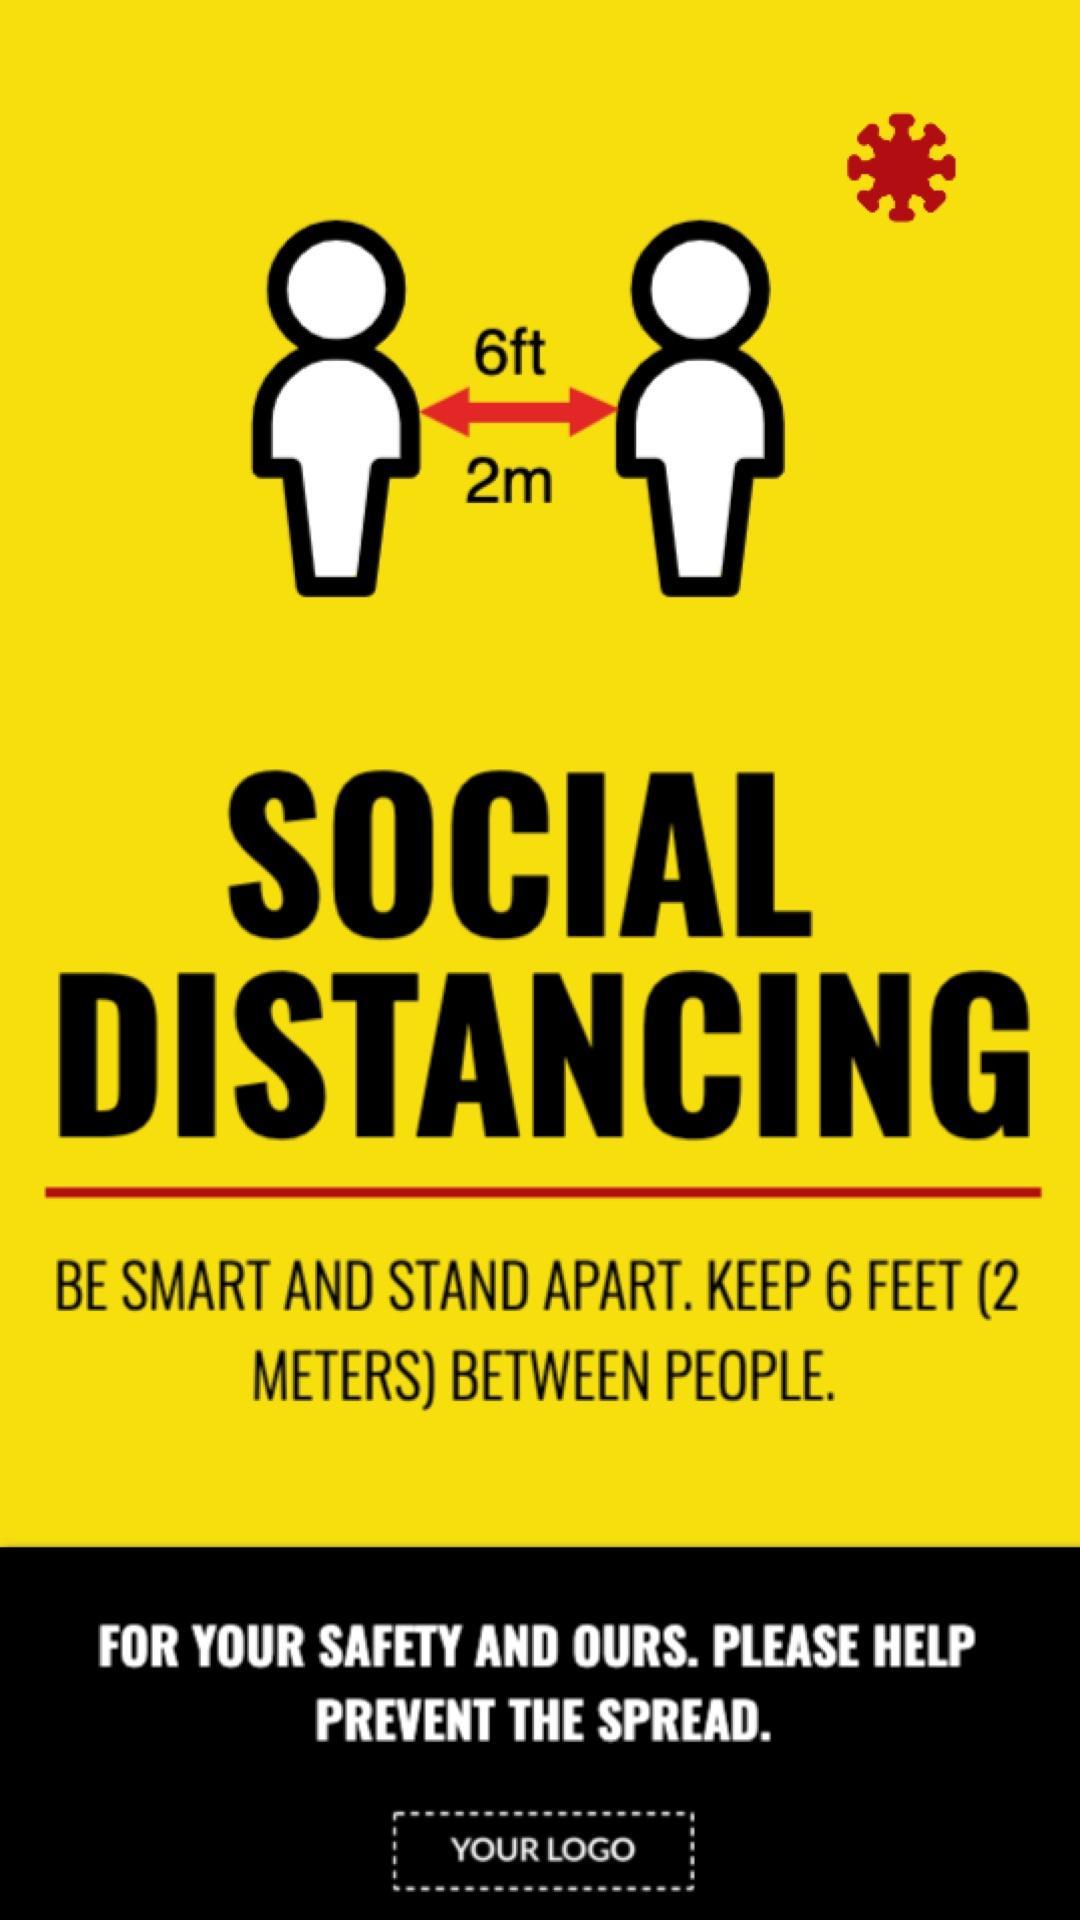 Campaign Social Distancing Text Portrait Digital Signage Template